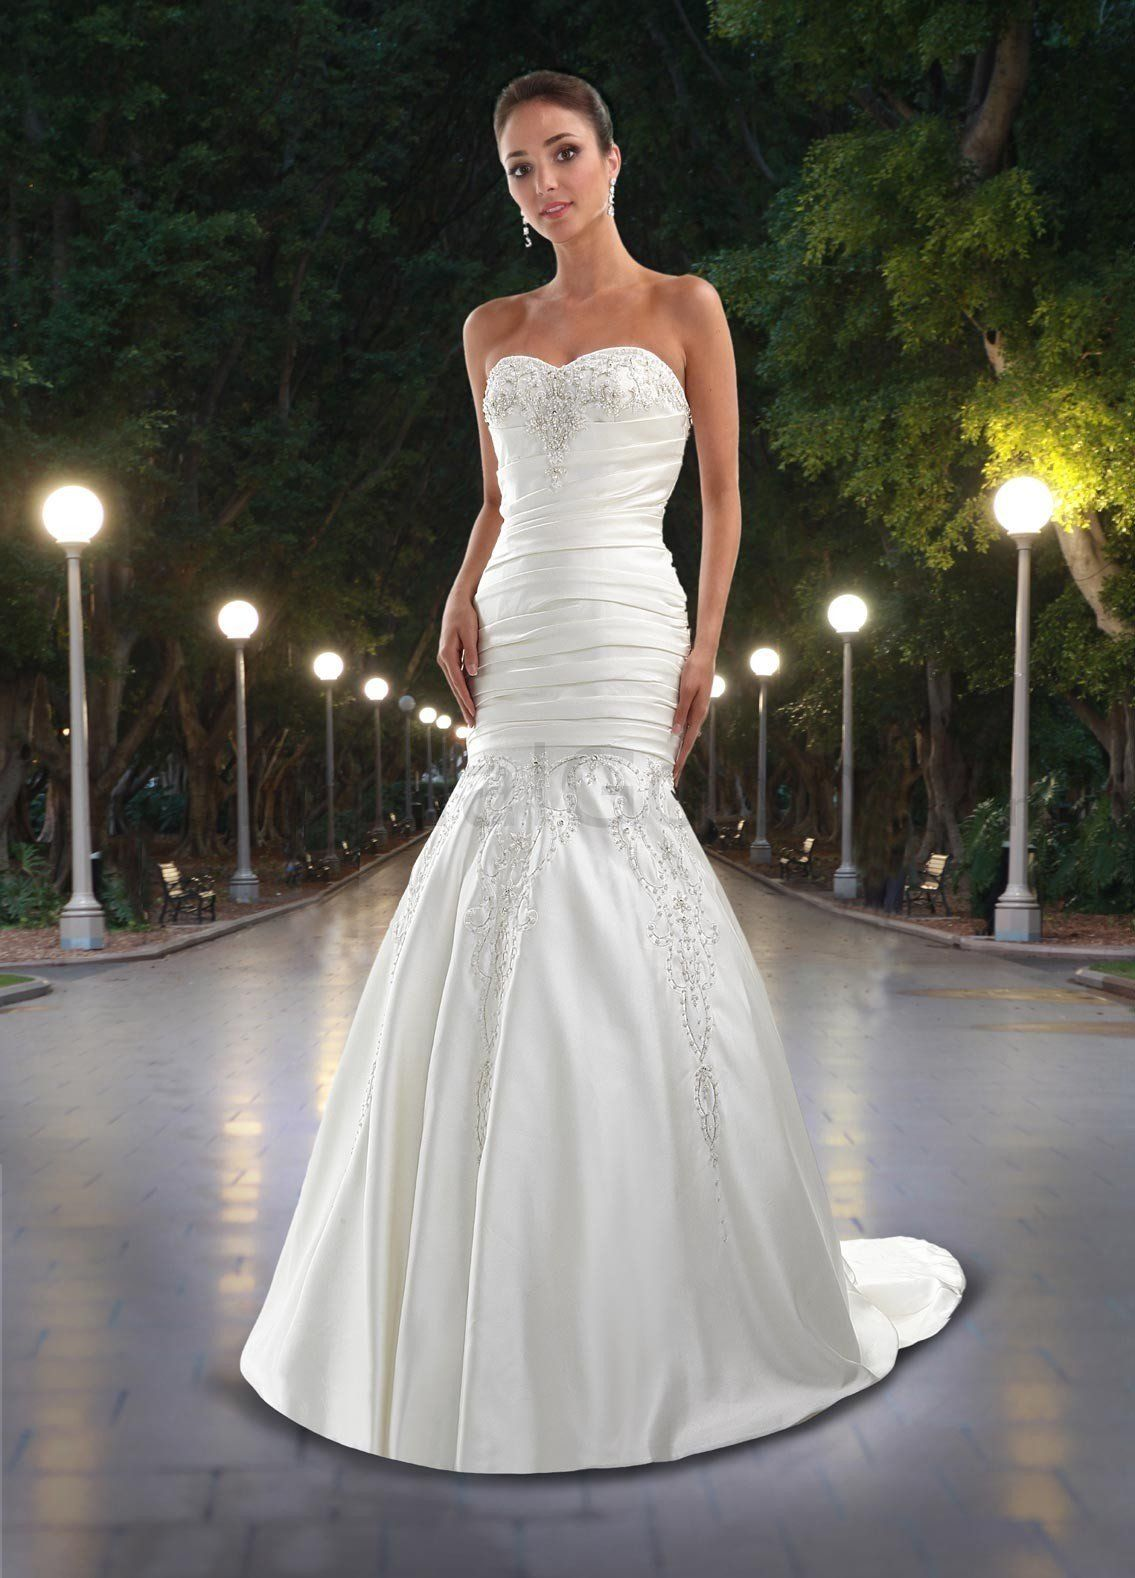 Sexy Mermaid Wedding Dresses | ... Corset Pleated Bodice Wedding ...